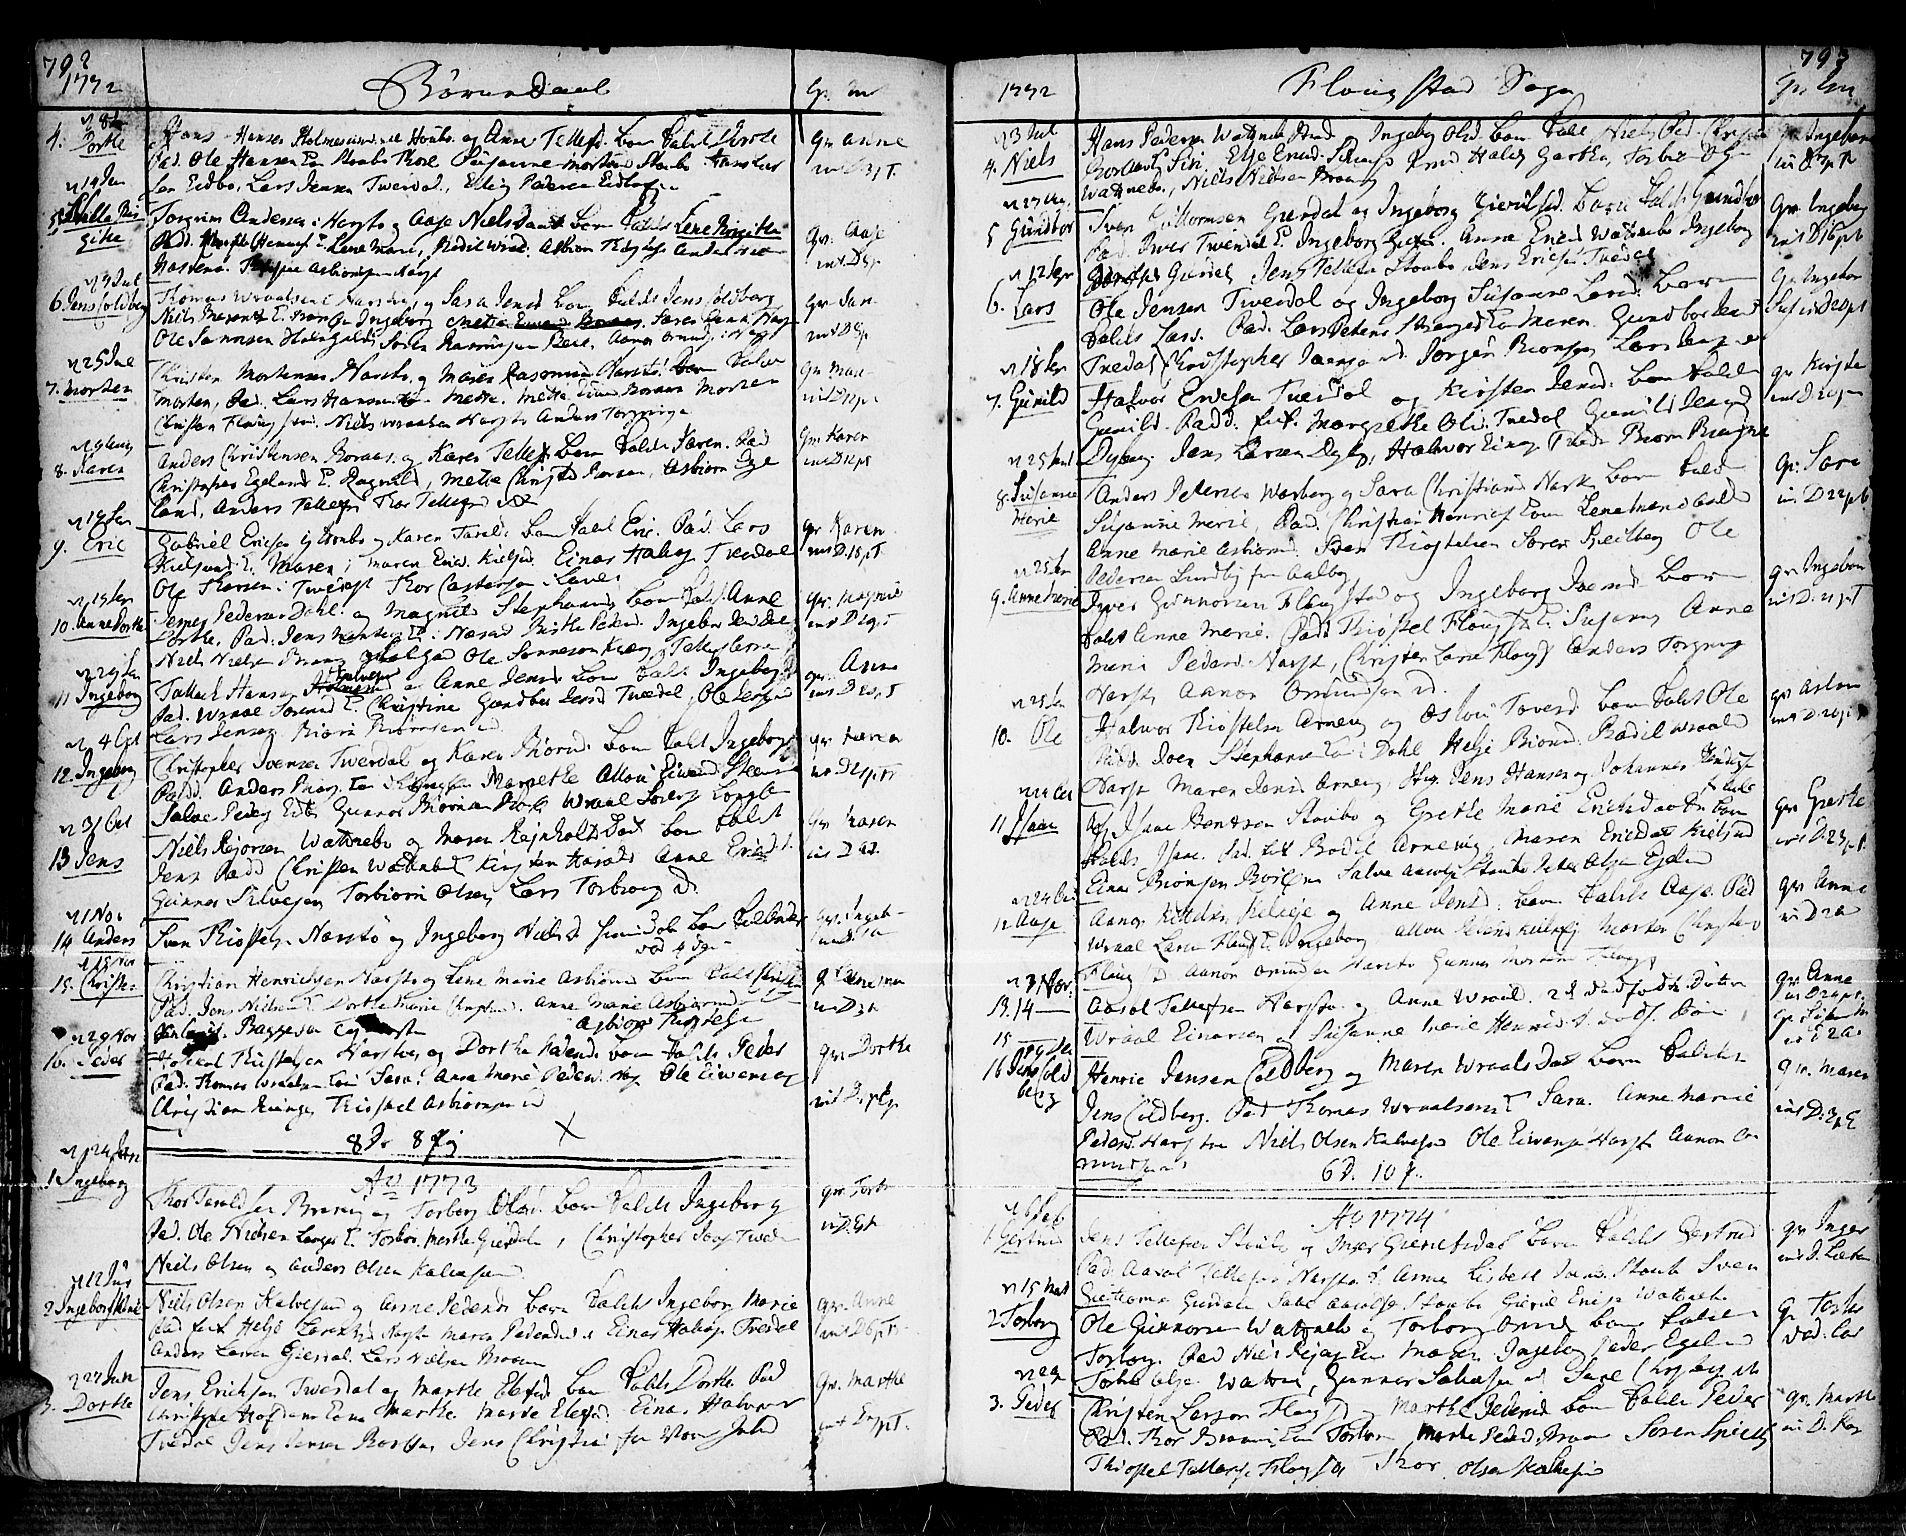 SAK, Dypvåg sokneprestkontor, F/Fa/Faa/L0001: Ministerialbok nr. A 1 /2, 1765-1798, s. 792-793